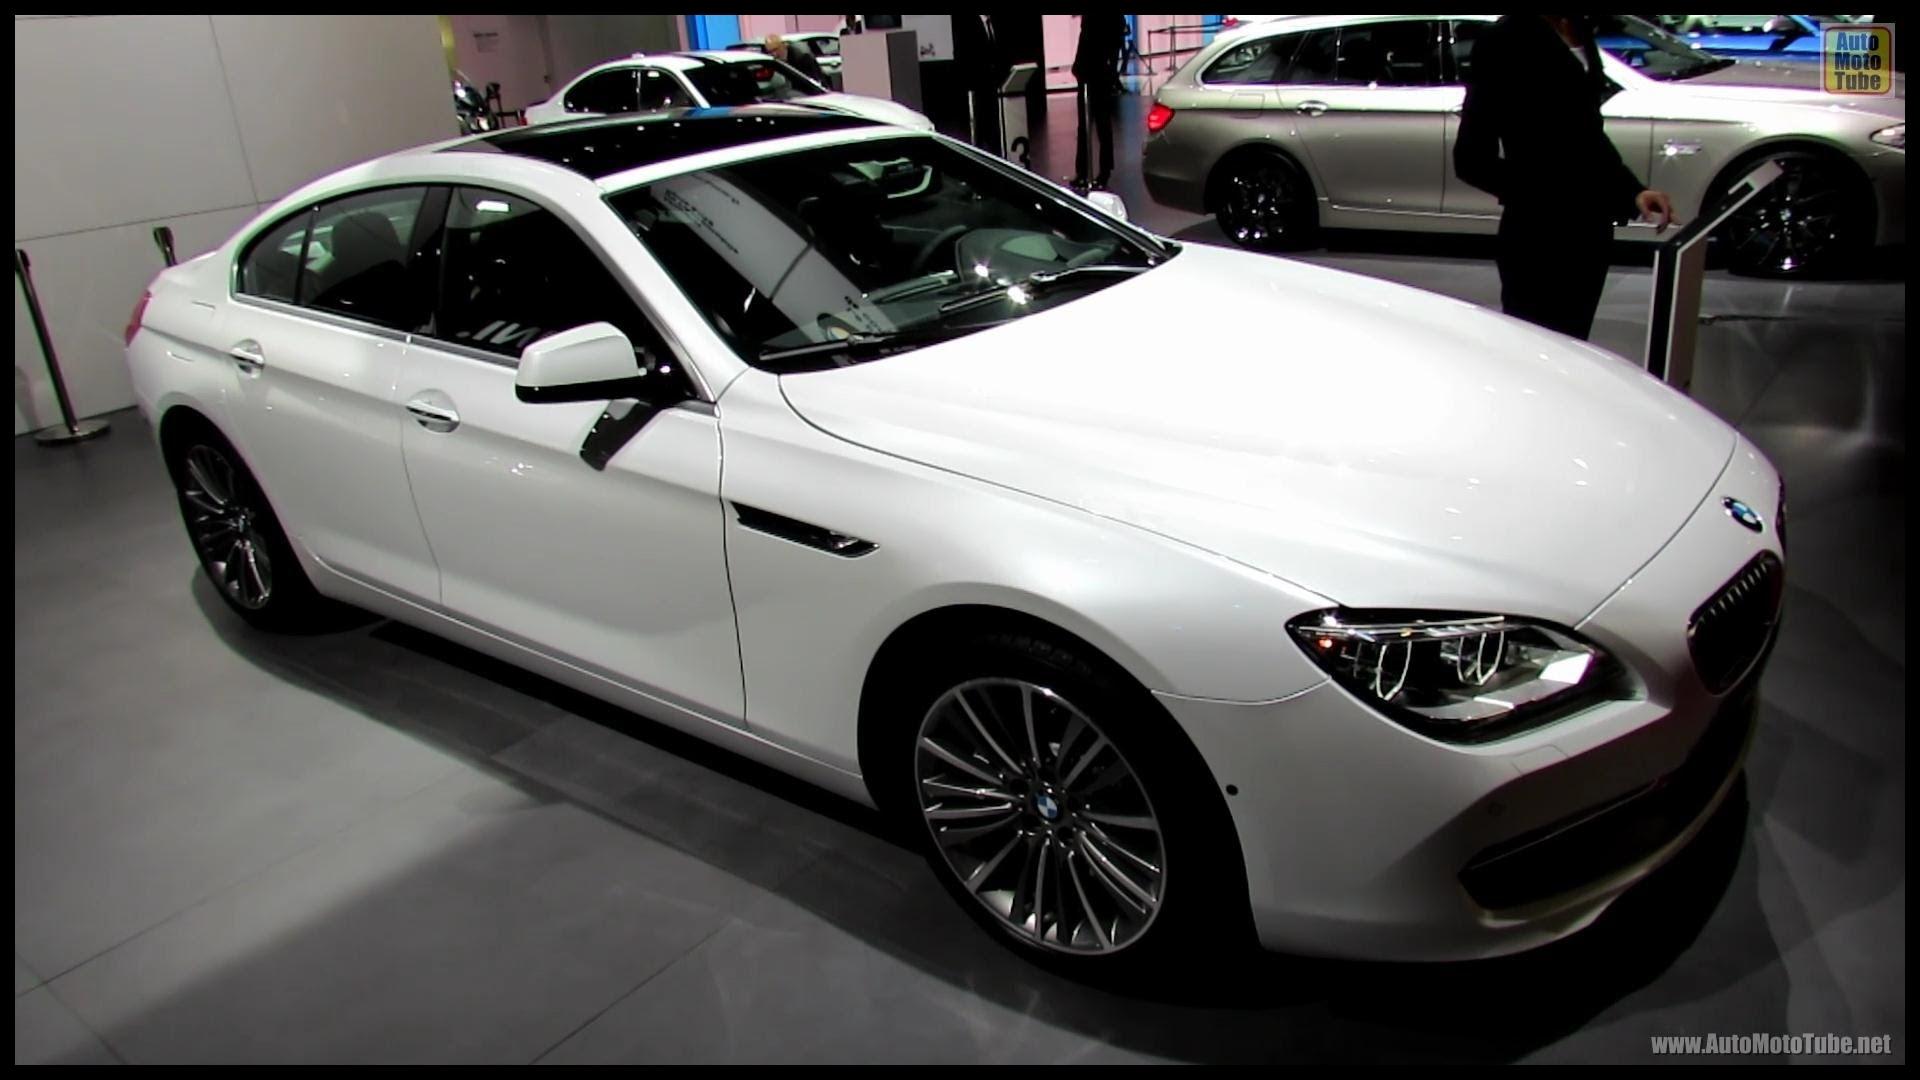 2013 BMW 650i xDrive Gran Coupe Exterior and Interior Walkaround 2012 Paris Auto Show